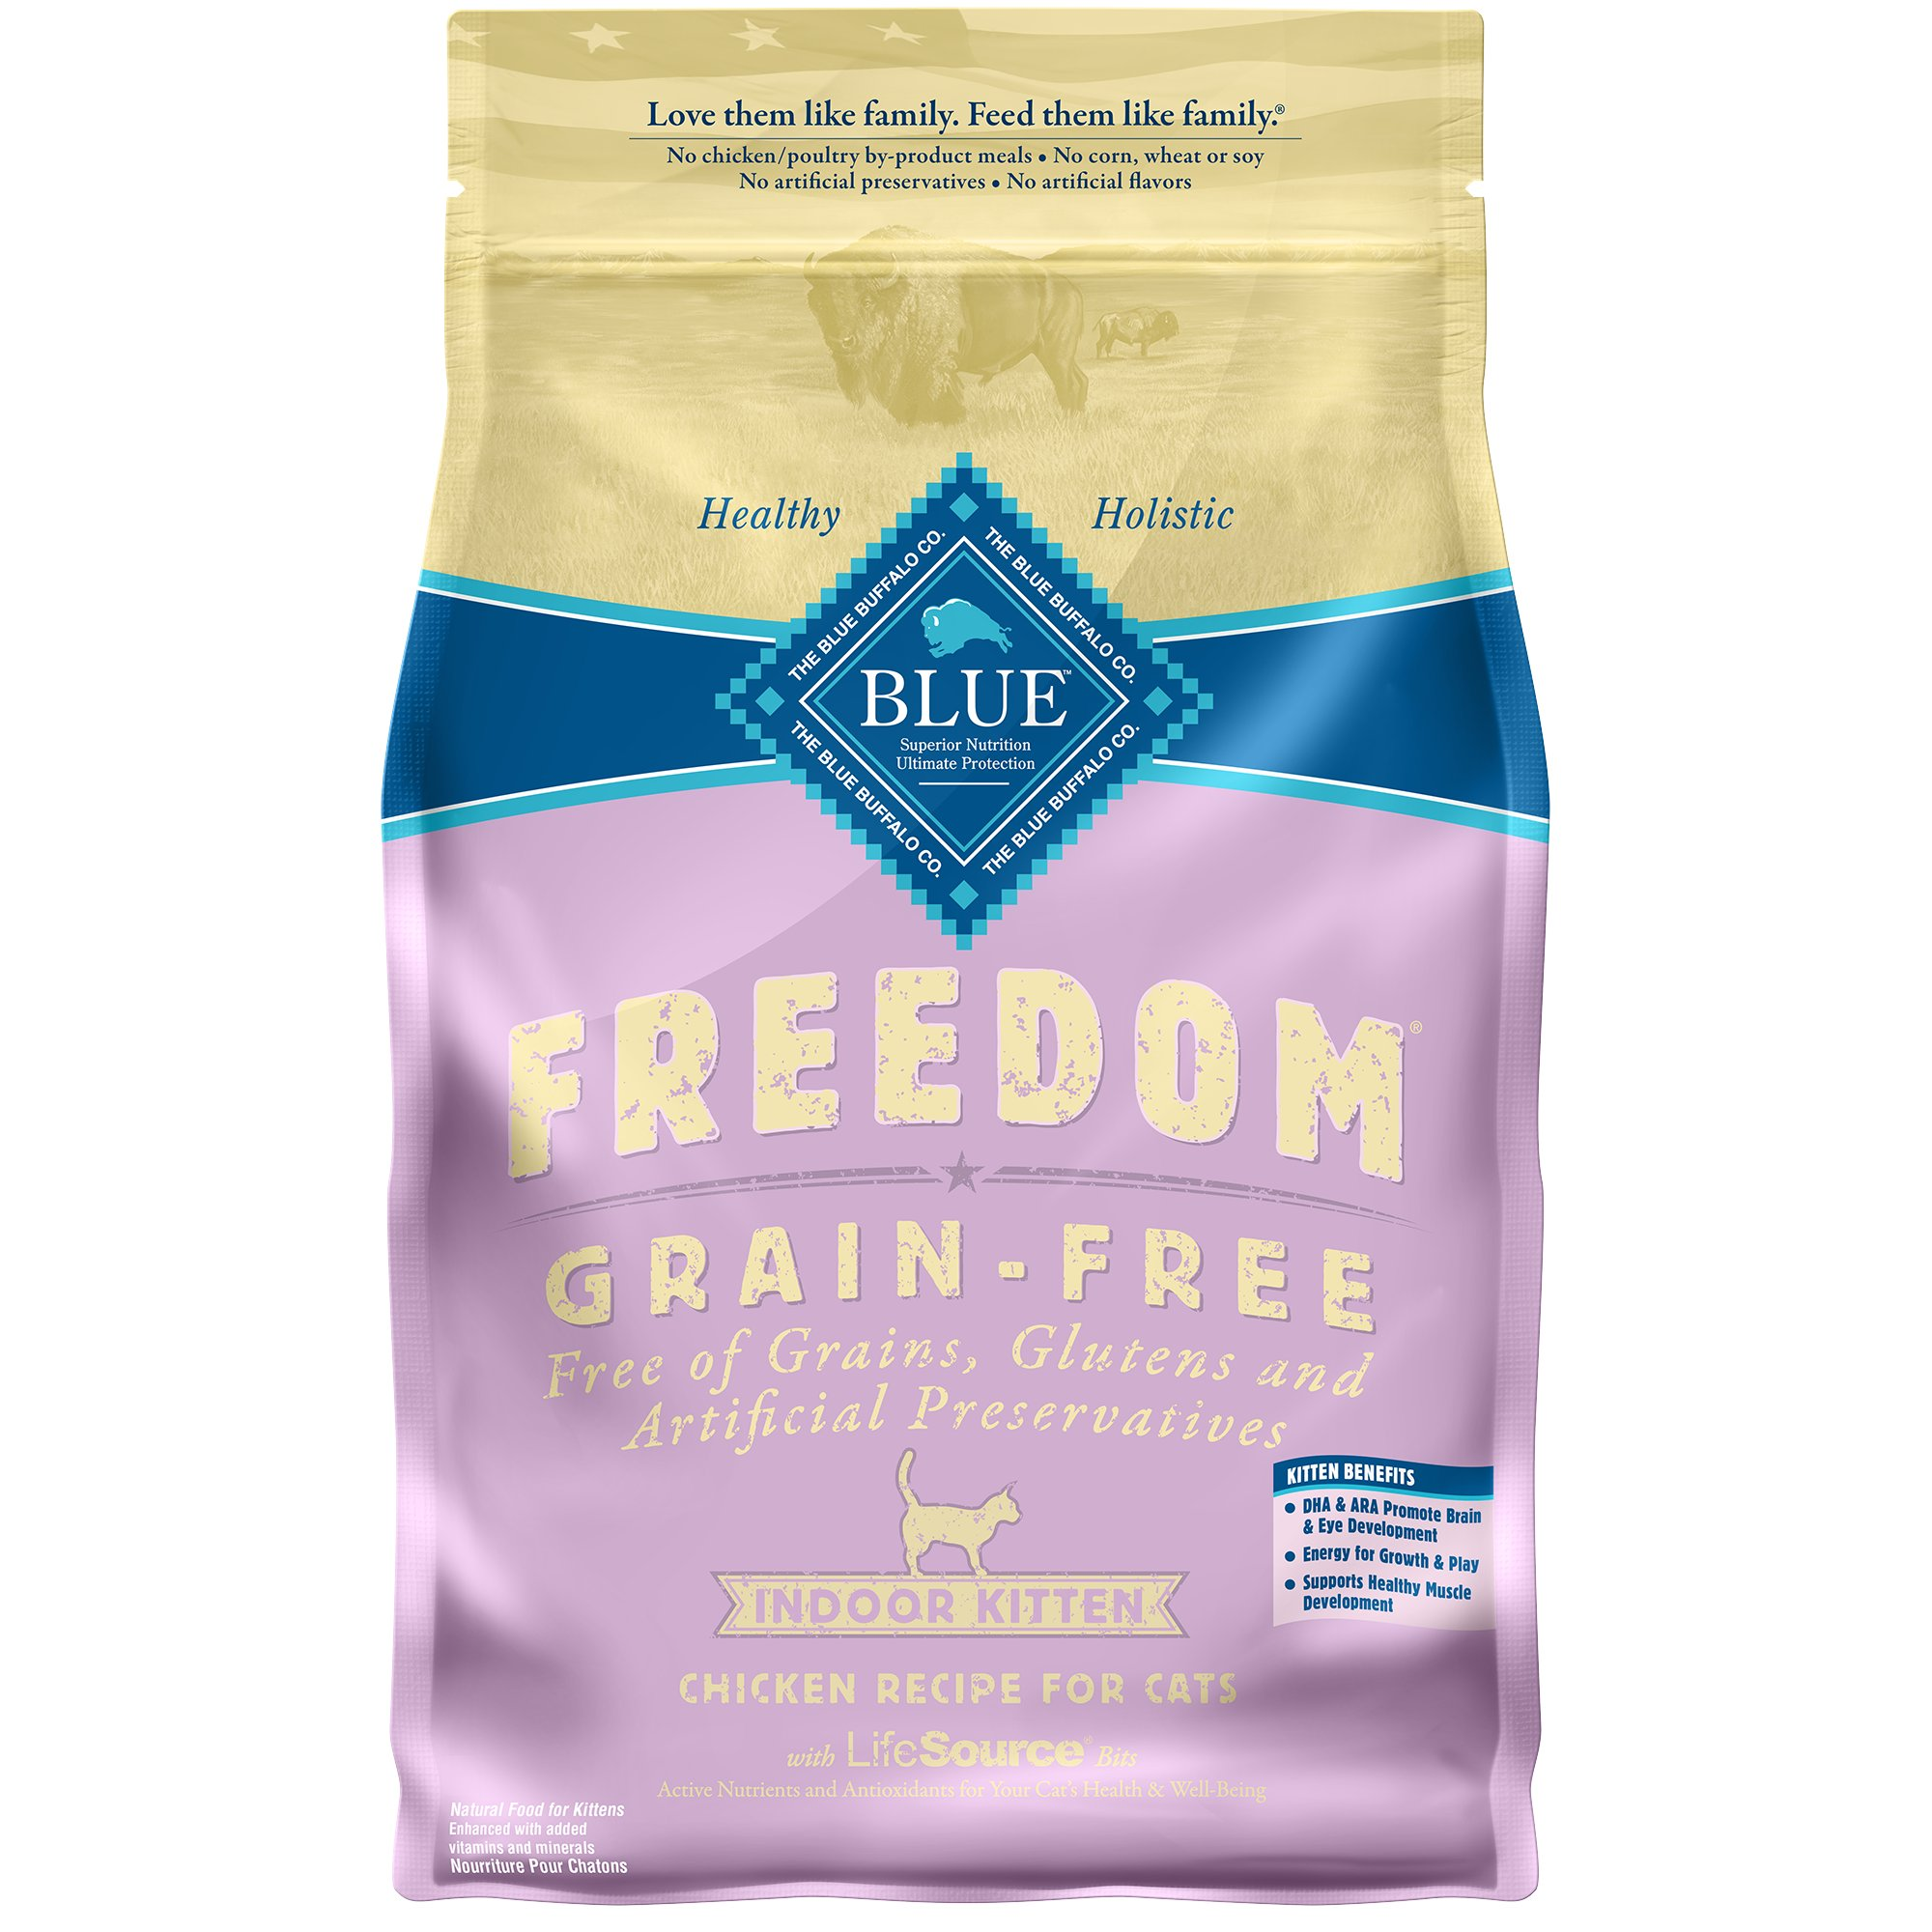 Blue Buffalo Freedom Grain Free Chicken Indoor Kitten Food